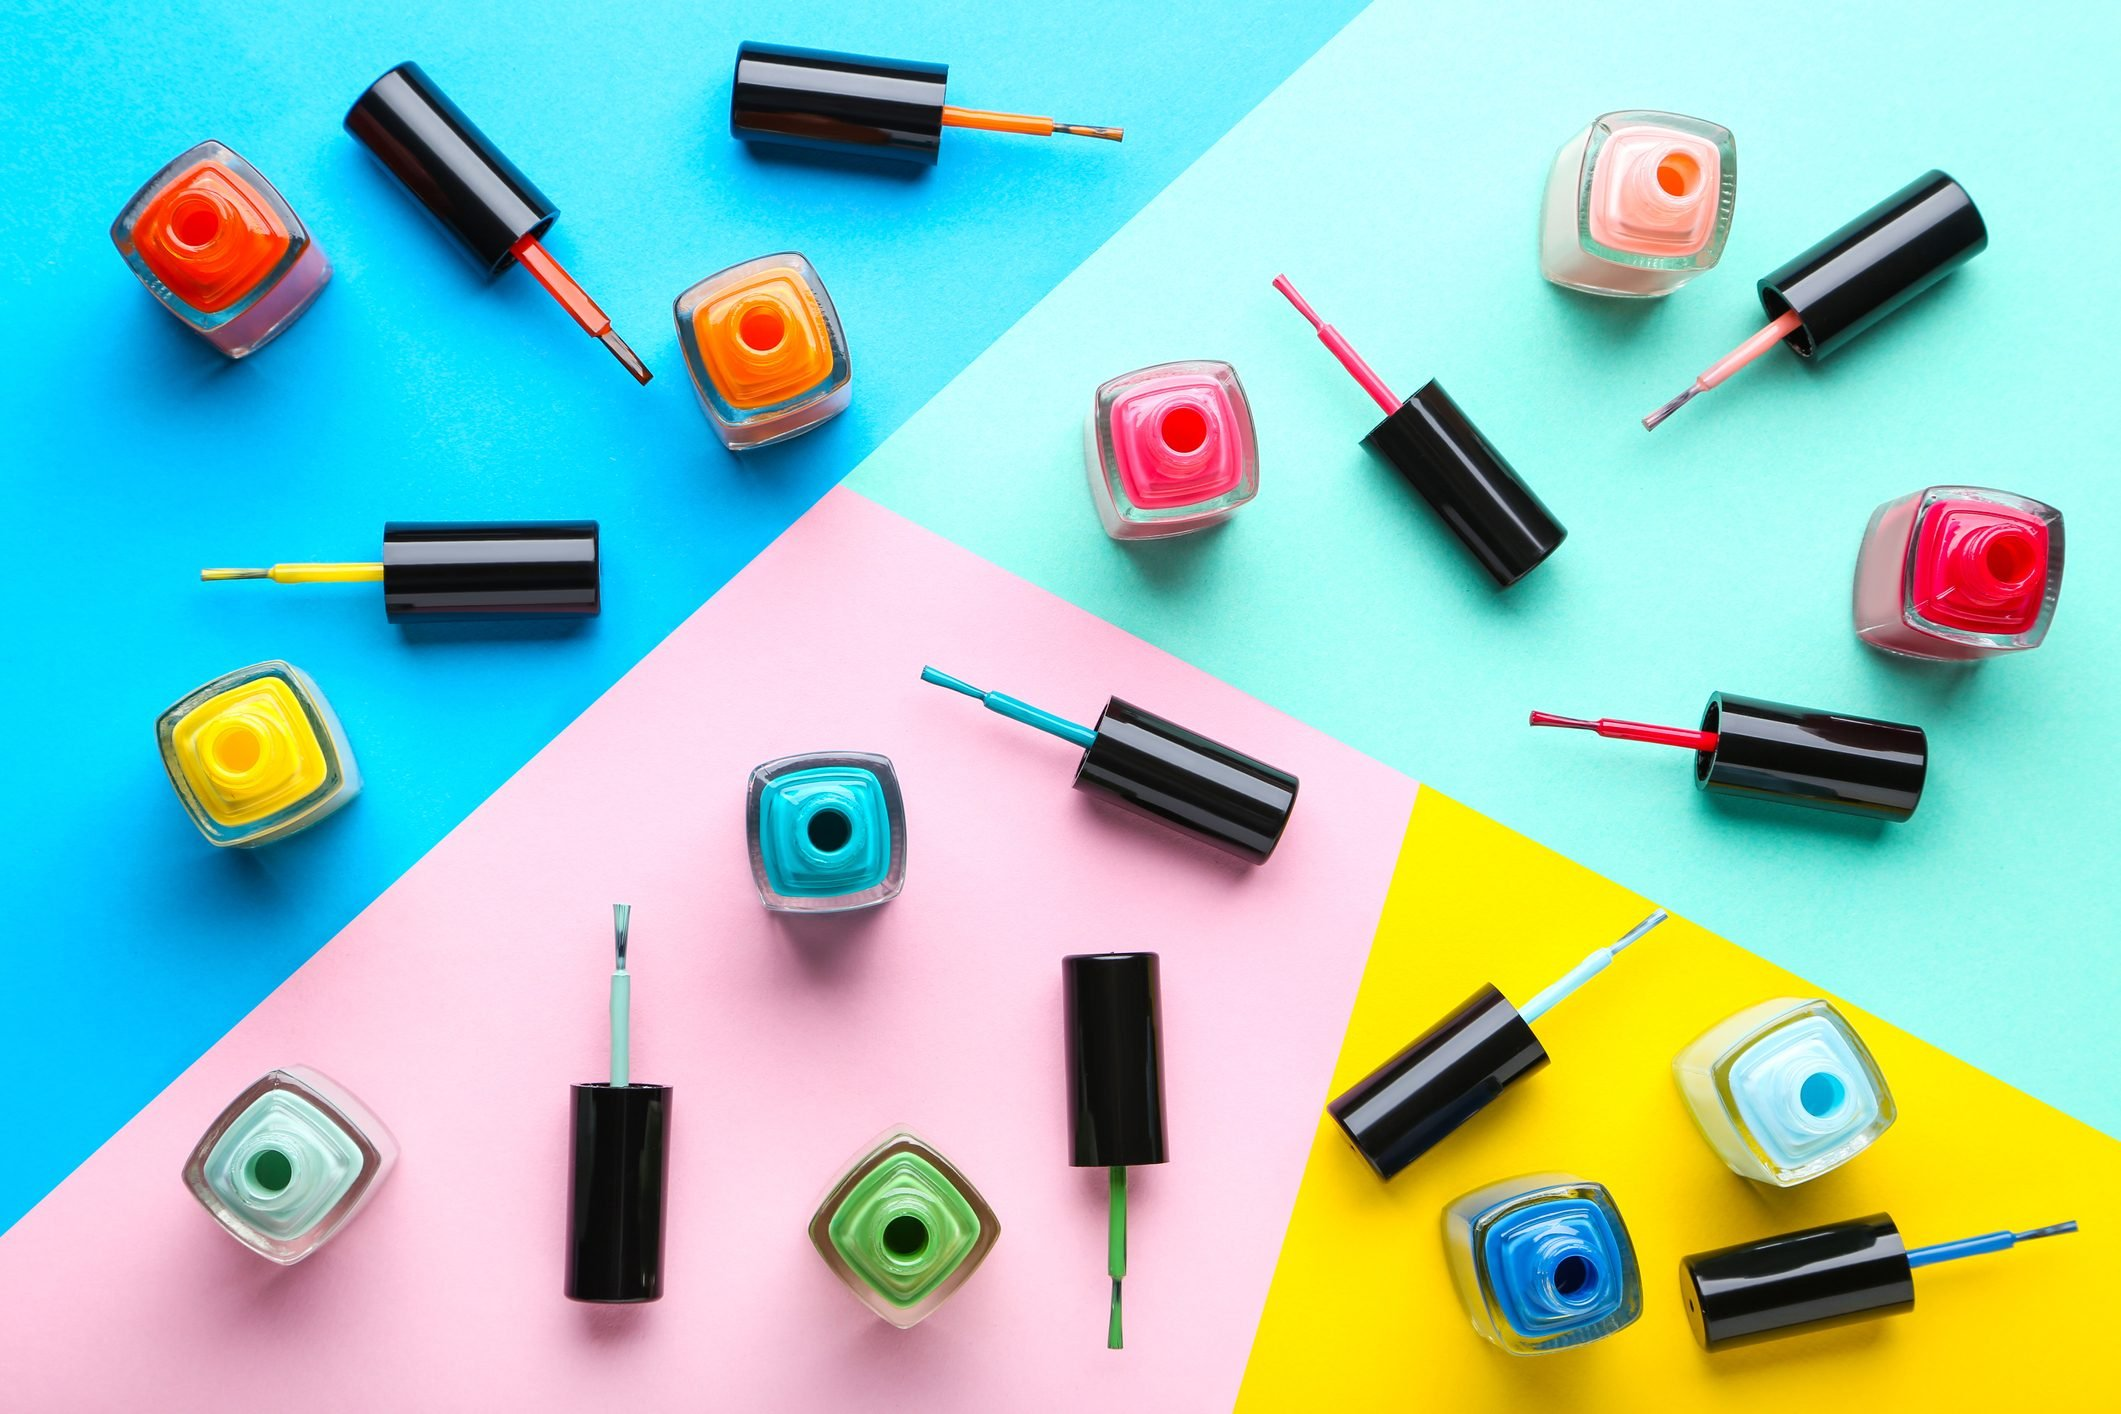 Nail polish bottles on colorful background